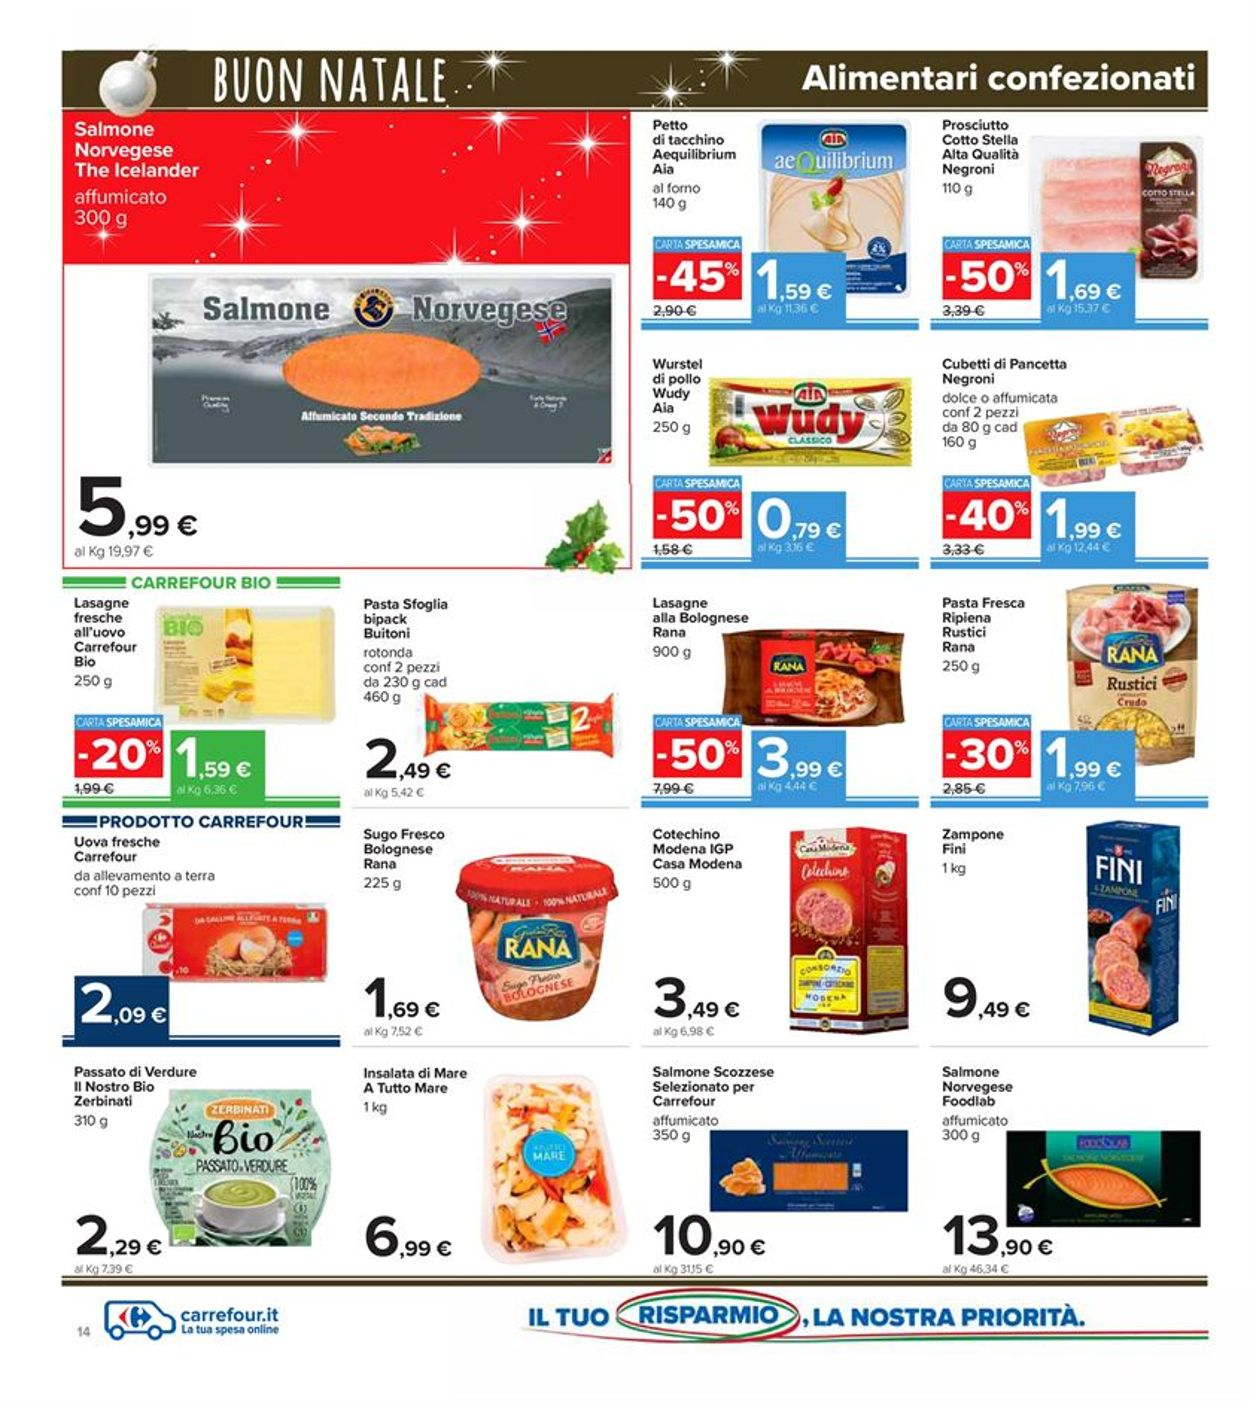 Volantino Carrefour - Natale 2020 - Offerte 14/12-27/12/2020 (Pagina 14)